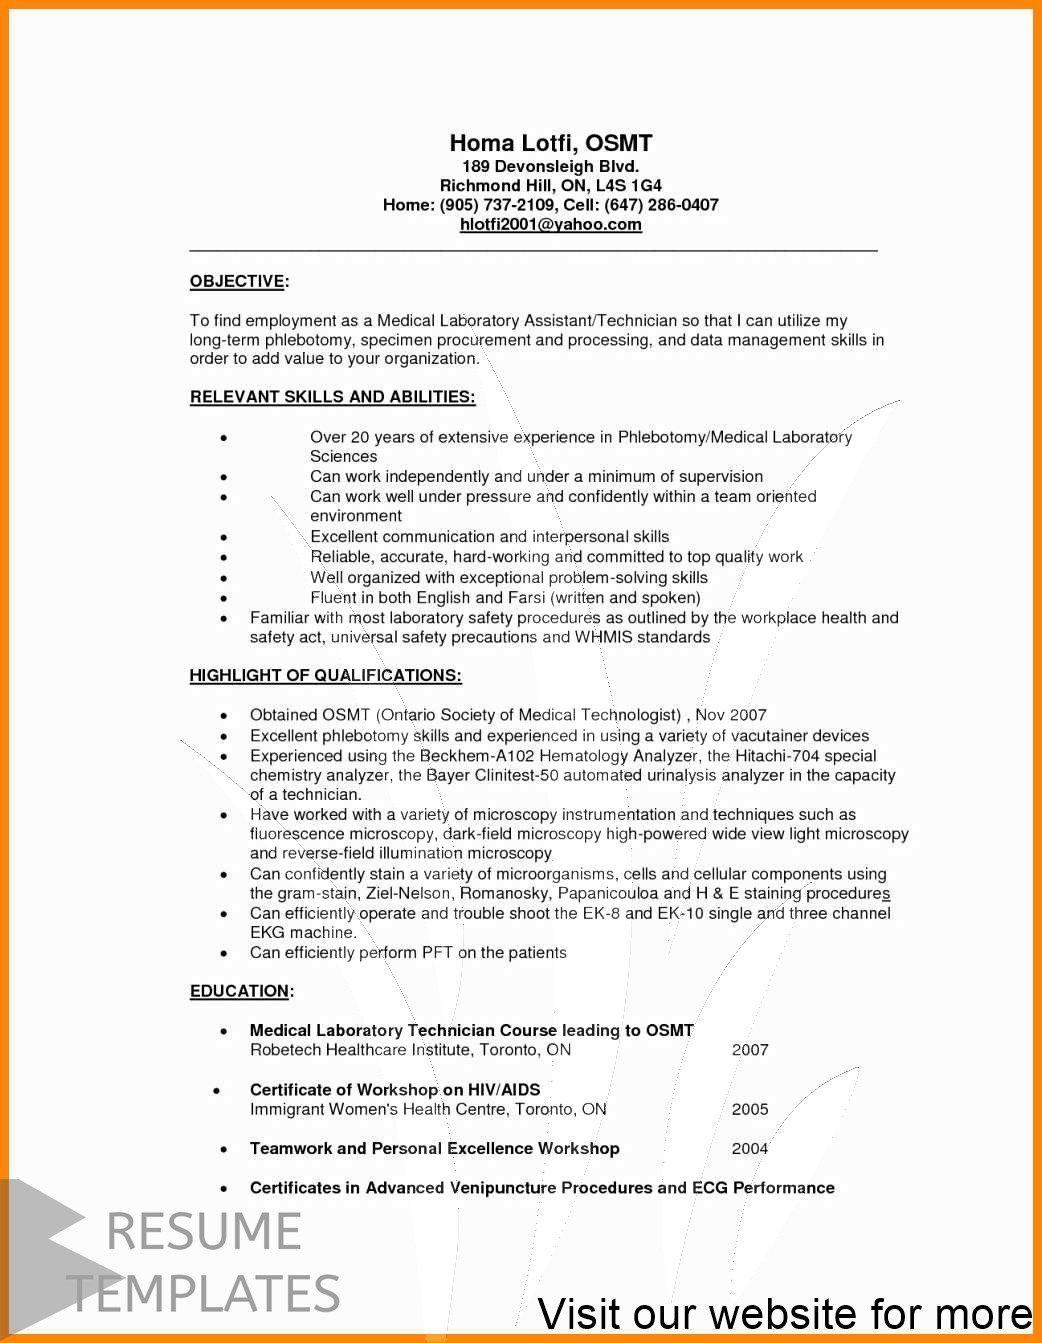 Sorority Resume Template Free Cv For Job Resume Templates Free Sorority Resume Template Free Free Resume Template Professional Resume Template Simple